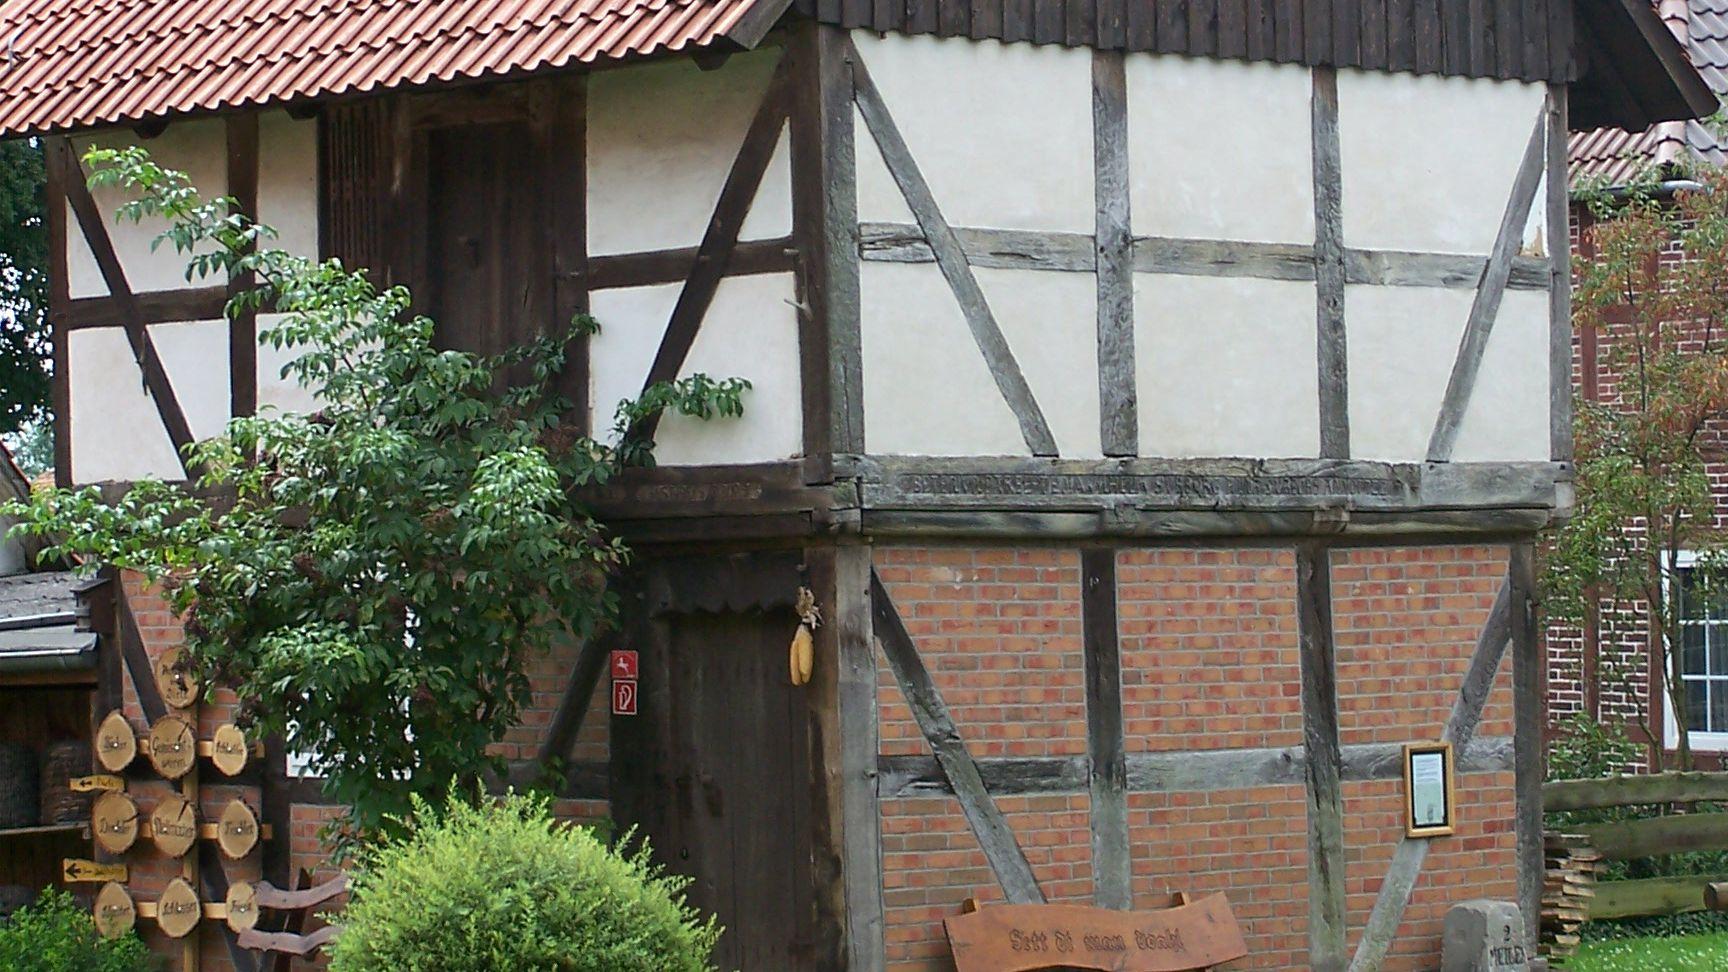 dorfmuseum-langlingen-a-historischer-speicher-jpg